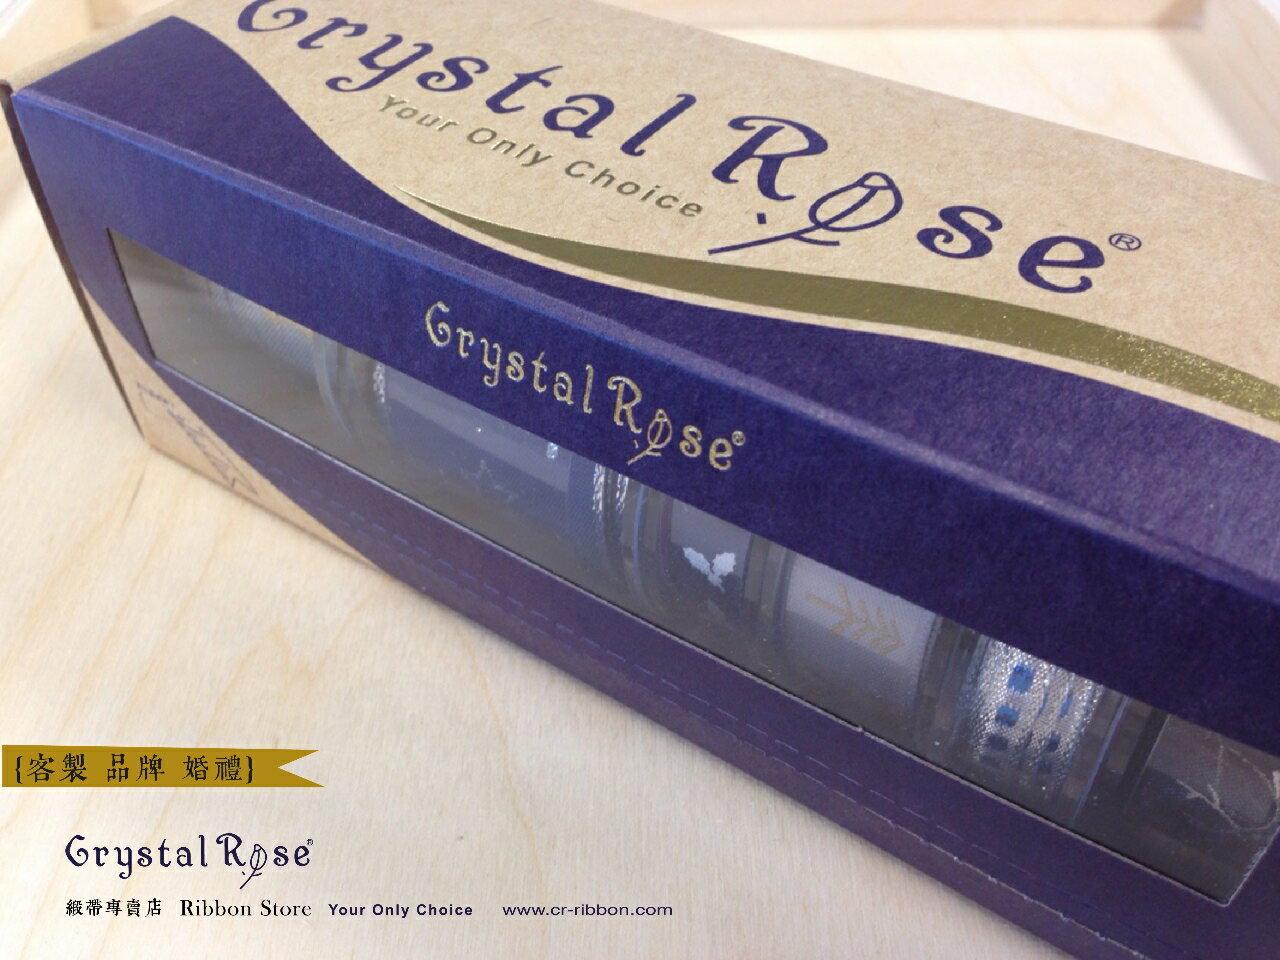 【Crystal Rose緞帶專賣店】白紗新娘緞帶禮盒(6入) 4